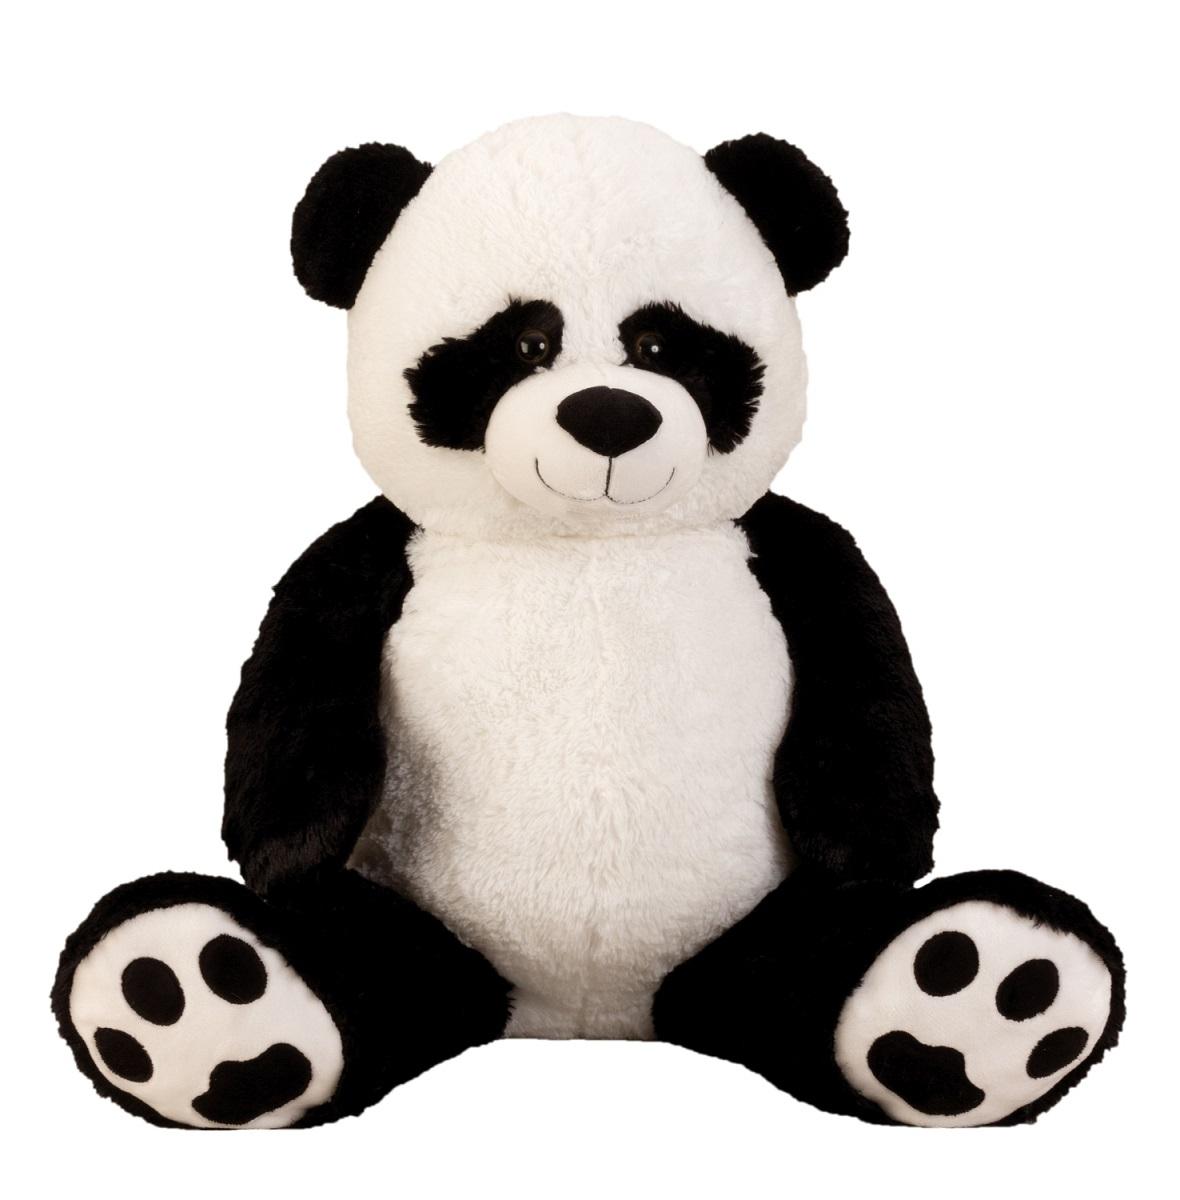 xxl panda b r teddyb r 1m riesen gro kuscheltier 100 cm. Black Bedroom Furniture Sets. Home Design Ideas